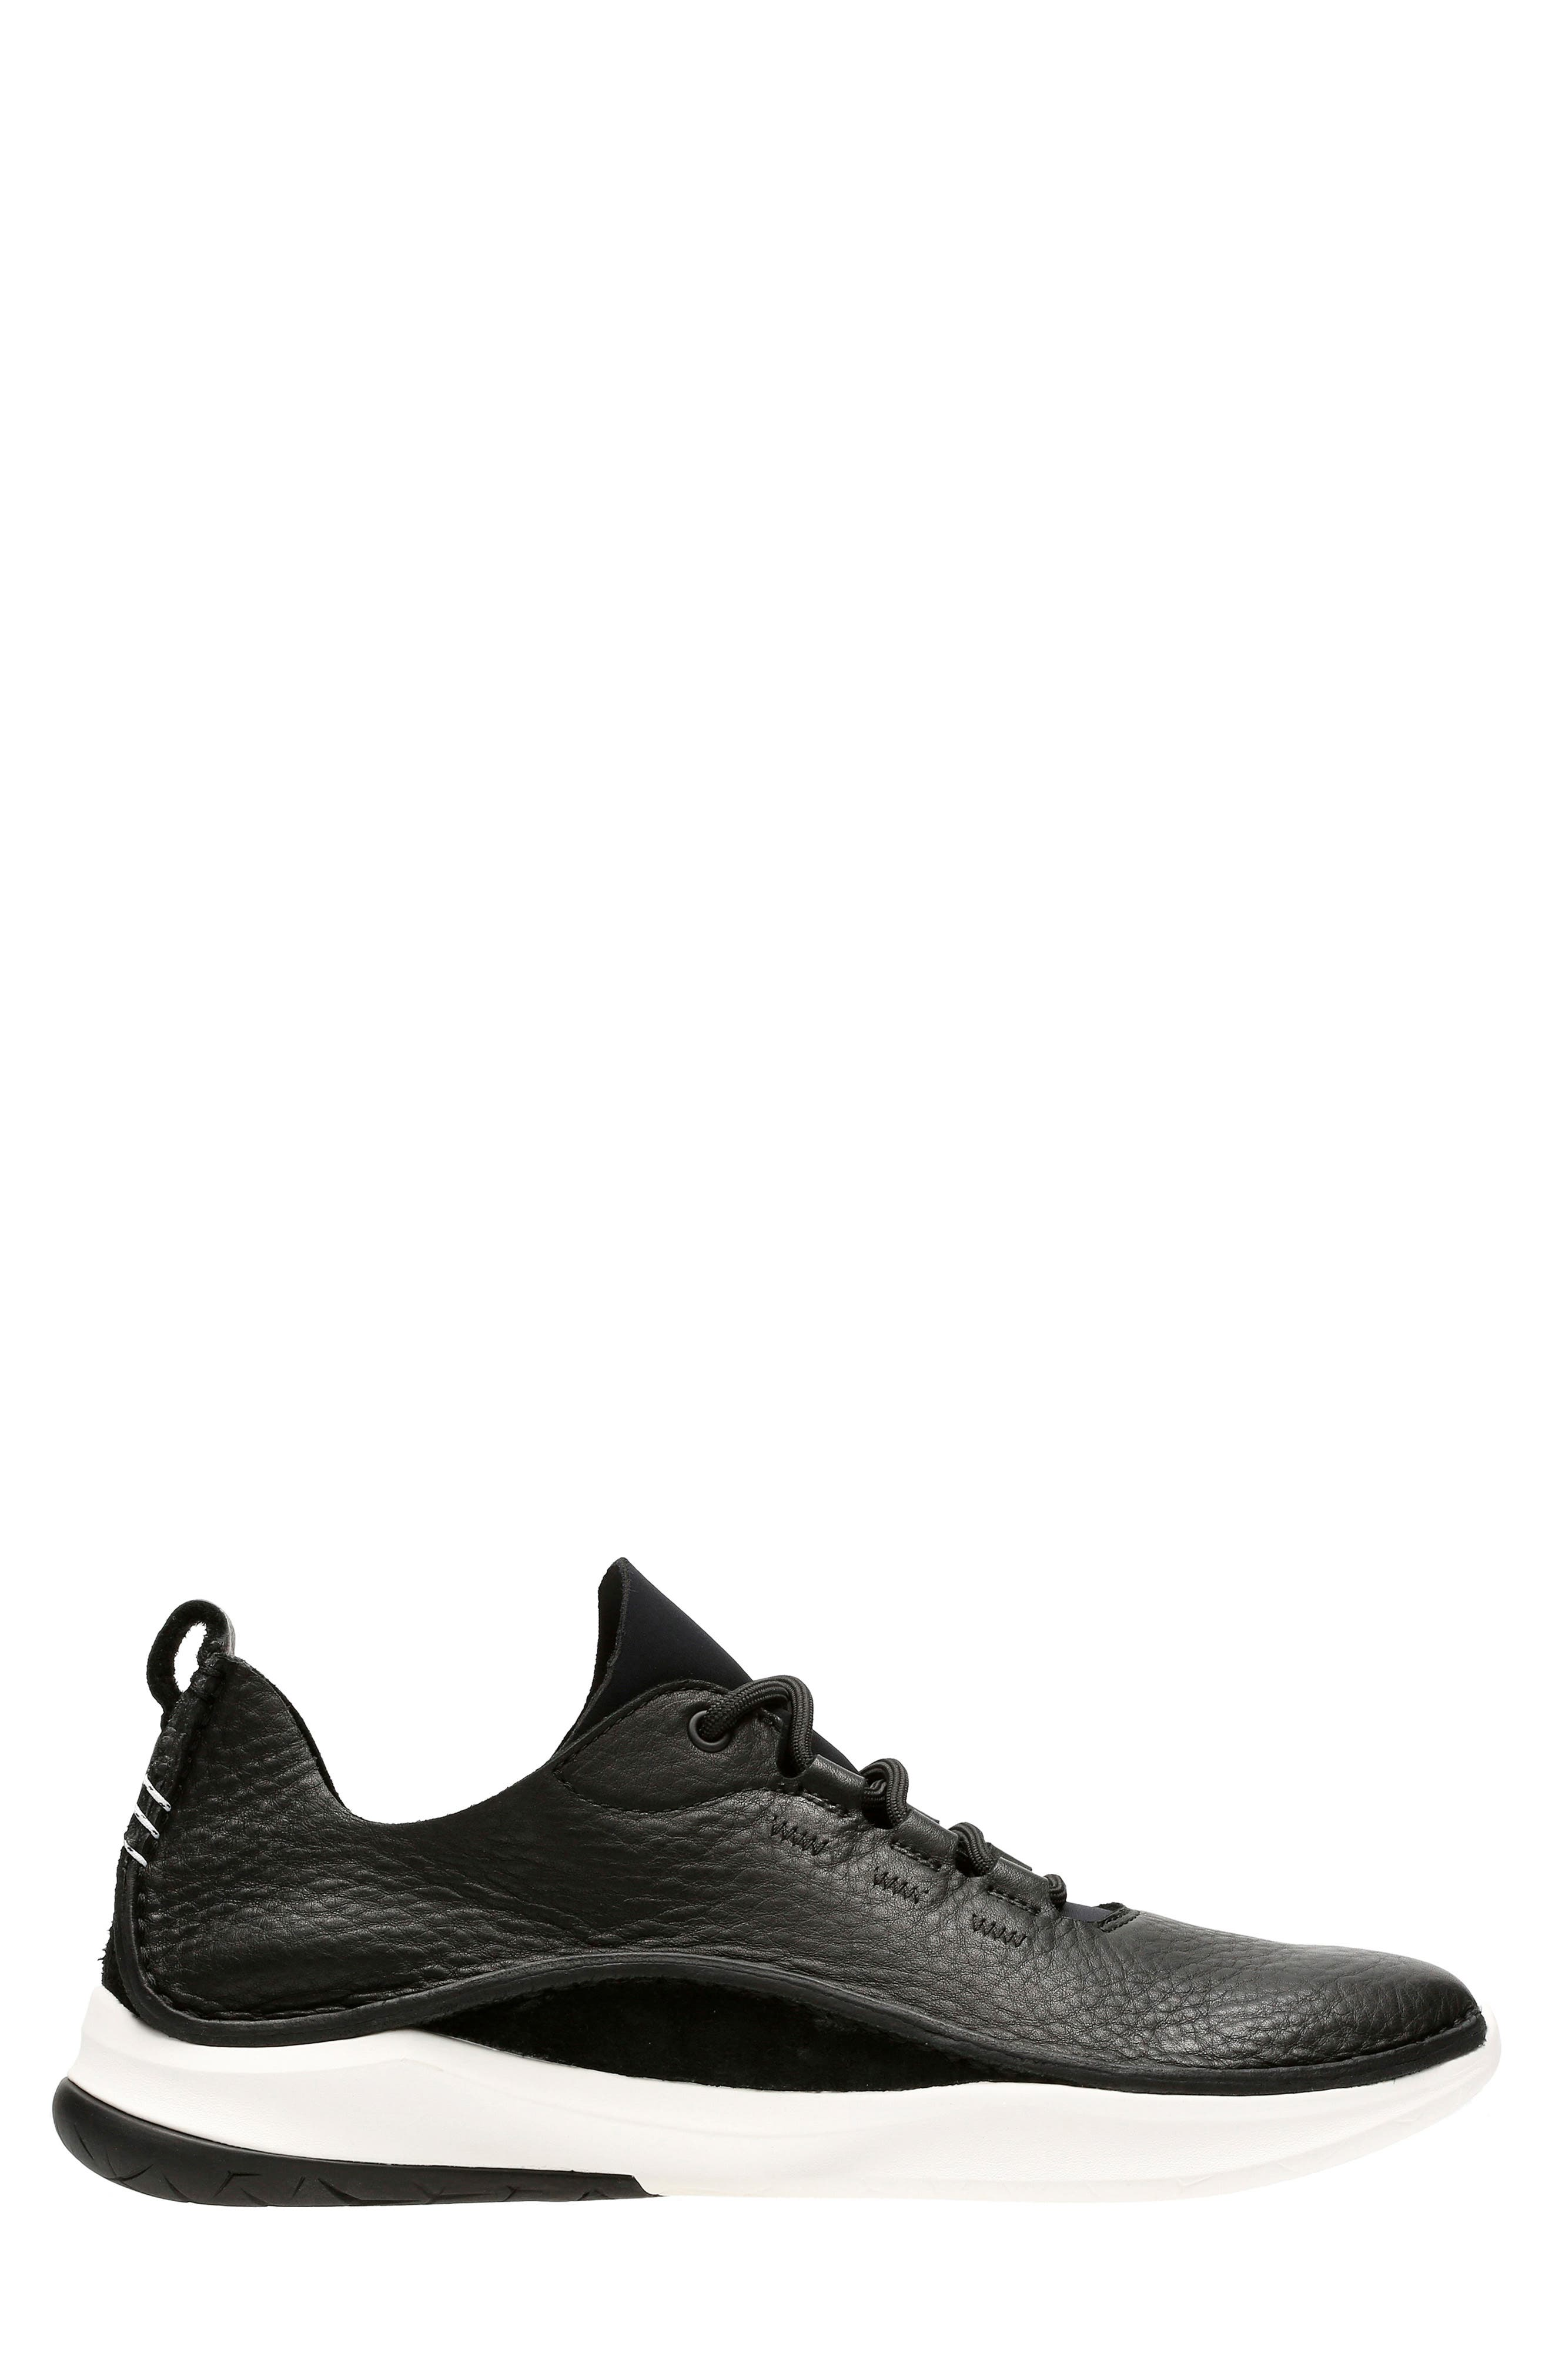 Privolution Lo Sneaker,                             Alternate thumbnail 2, color,                             BLACKOUT